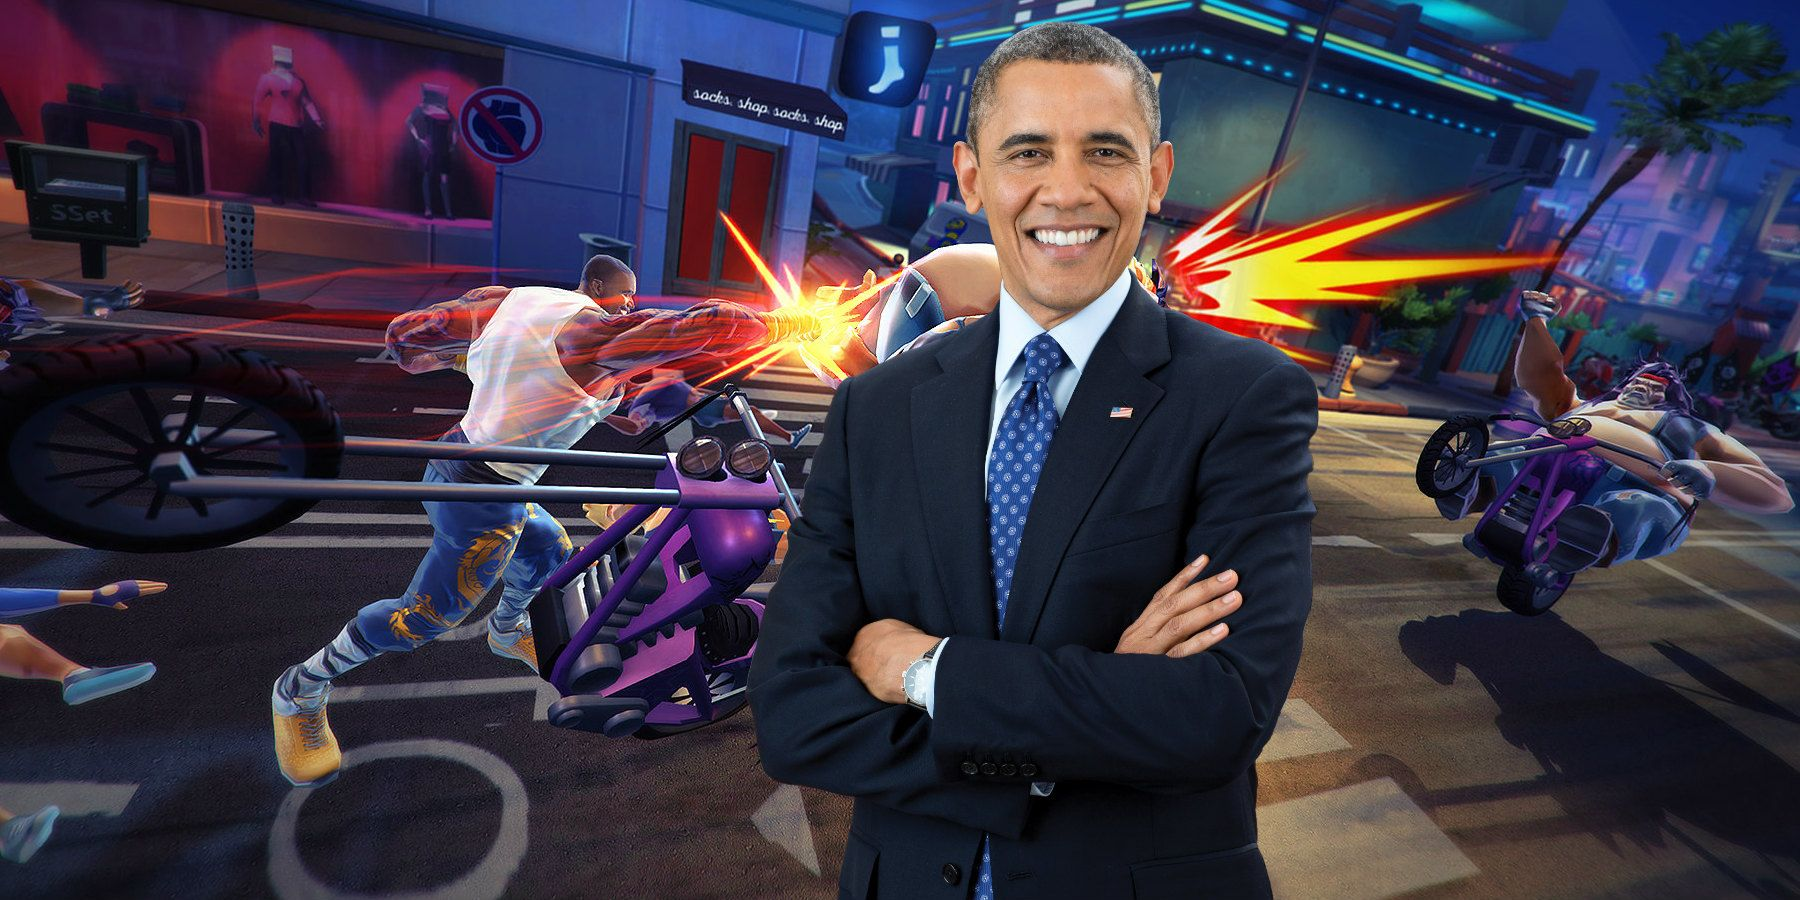 Shaq-Fu DLC Lets You Fight Kanye as Obama